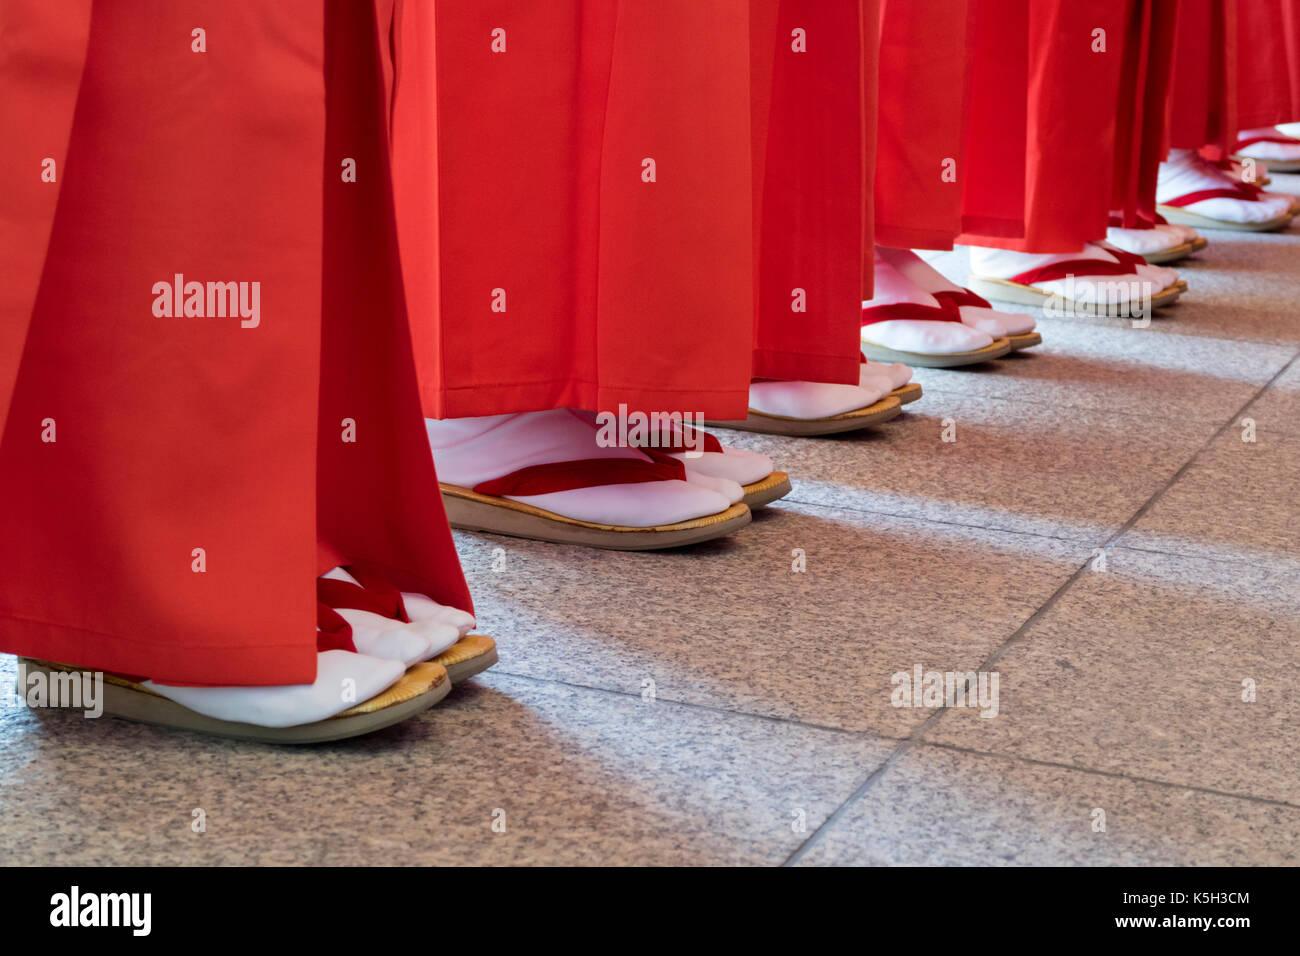 Hiroshima, Japan -  May 27, 2017: Mantō Mitama Matsuri at the Hiroshima Gokoku-jinja Shrine, the spectacle of 100 shrine maidens dancing by lantern li - Stock Image